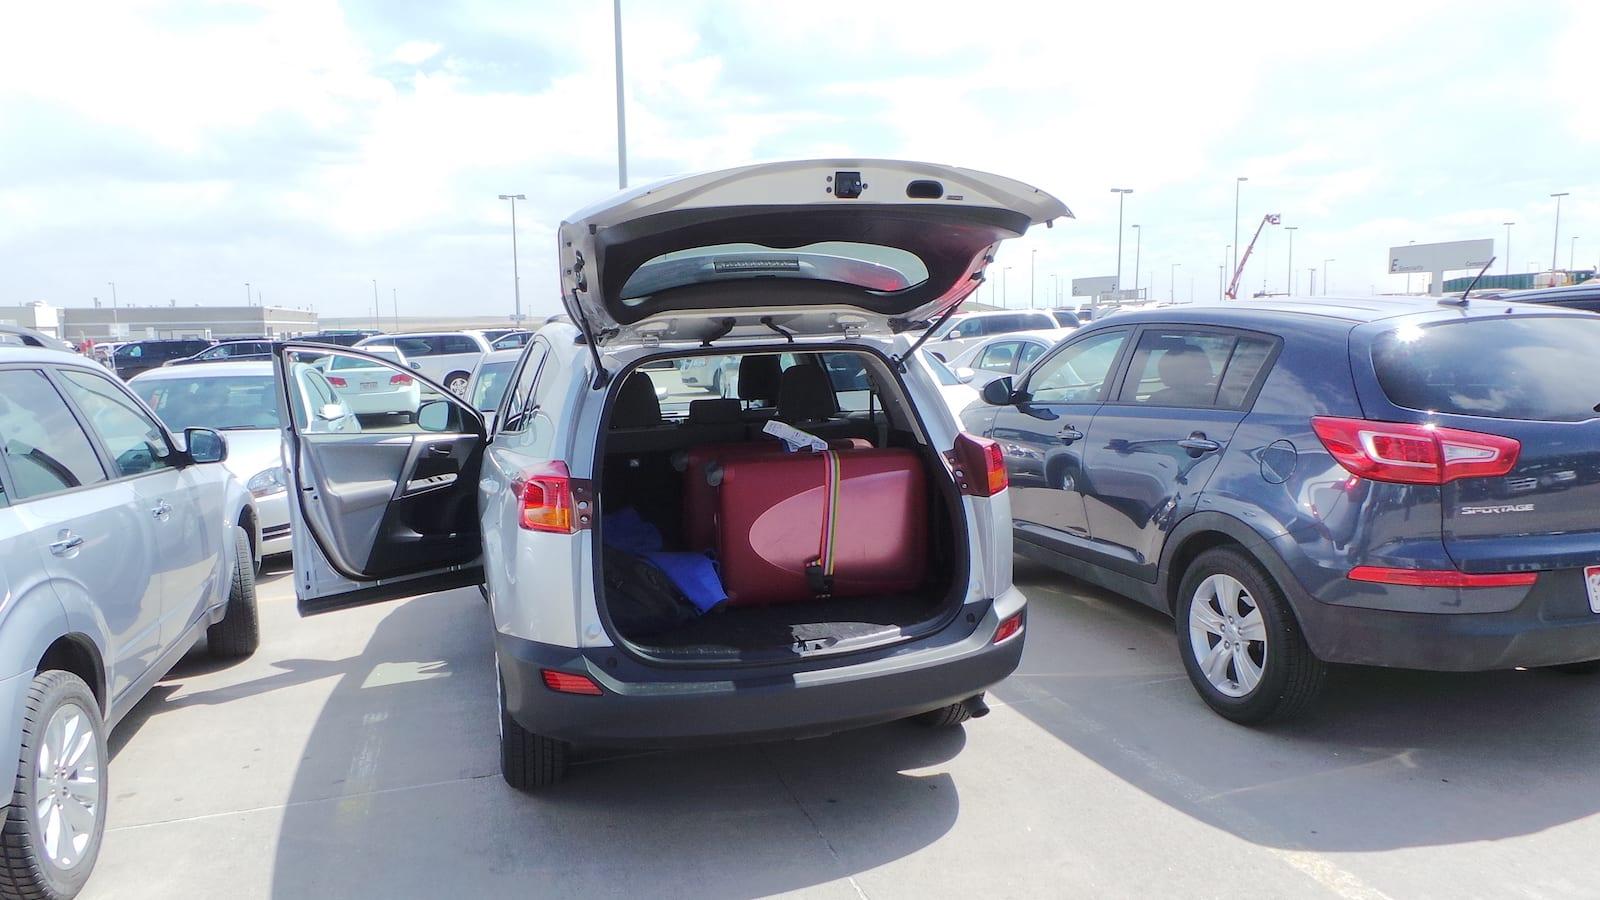 Car Rental Denver Airport Alamo Parking Lot